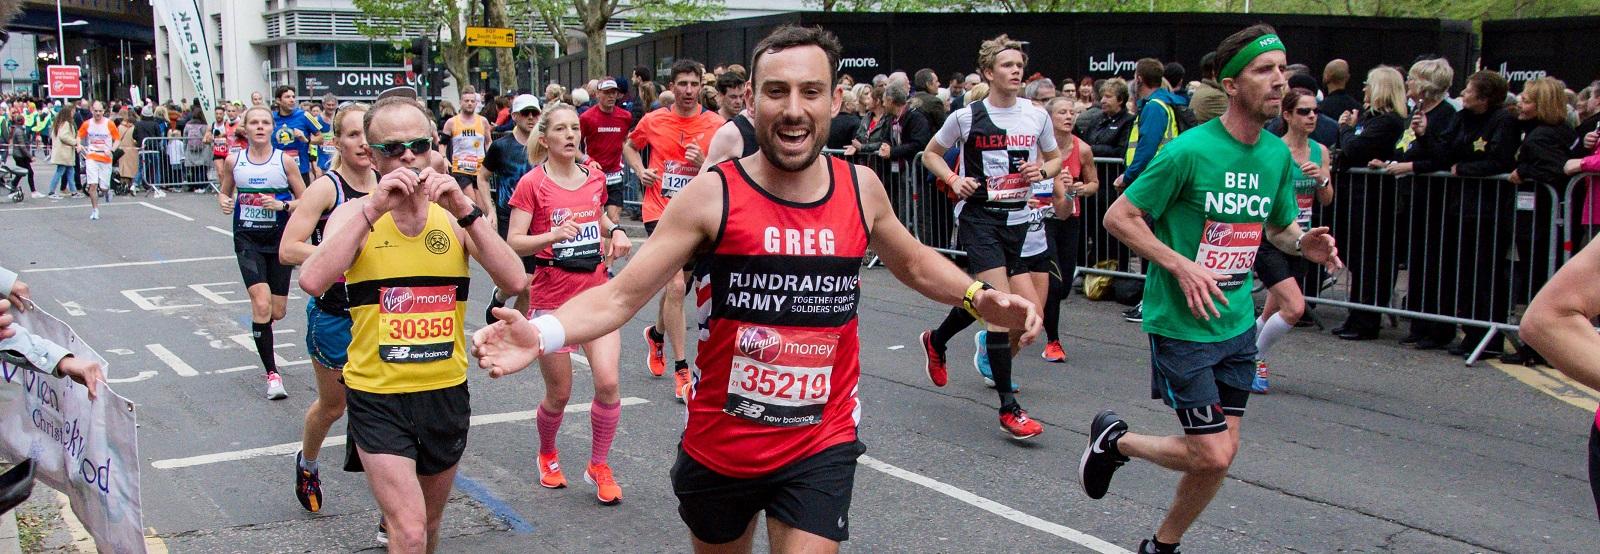 TCS London Marathon 2022